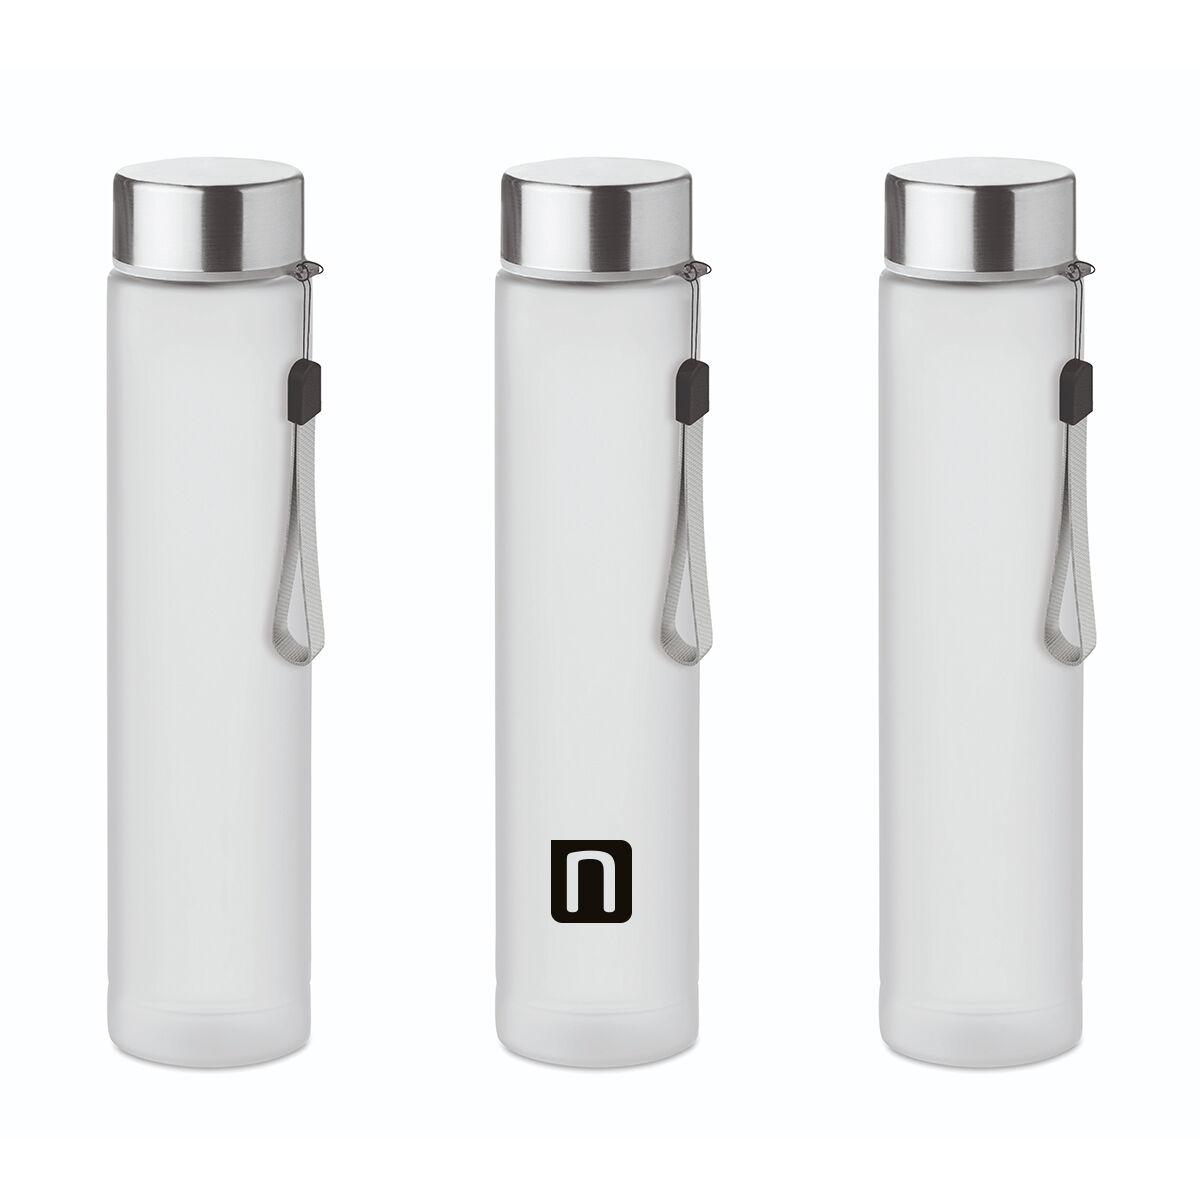 Slim Travel bottle in tritan 300 ml with stainless steel lid